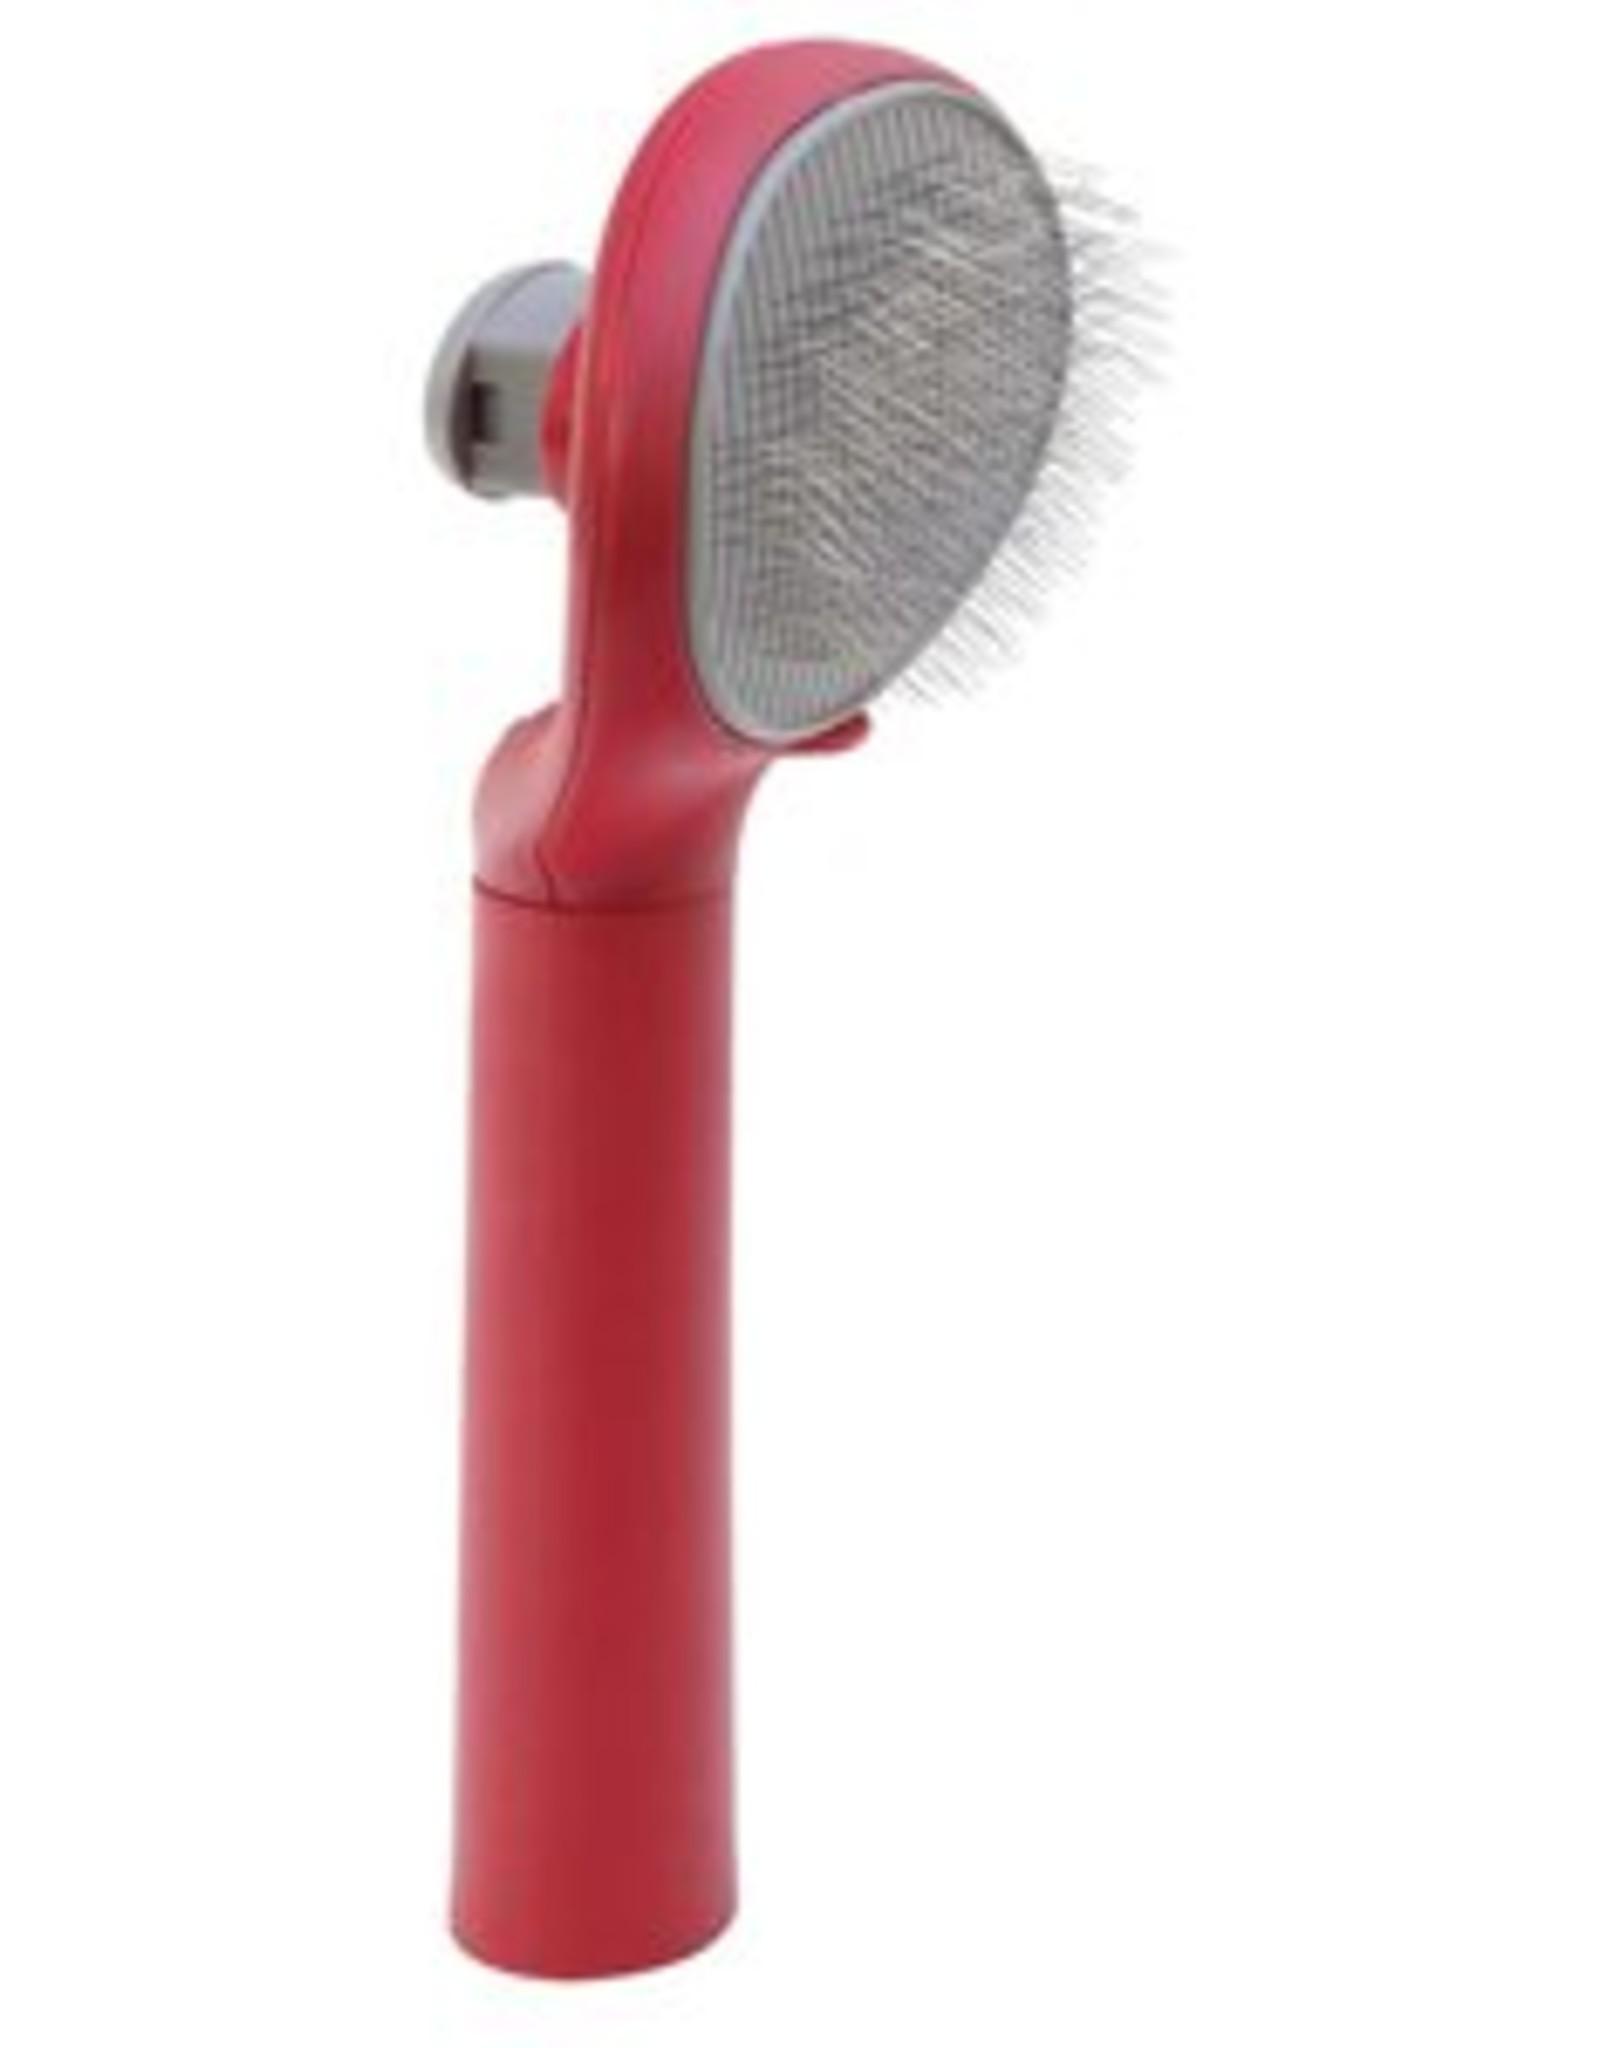 Hagen Le Salon Self Cleaning Slicker Brush Large